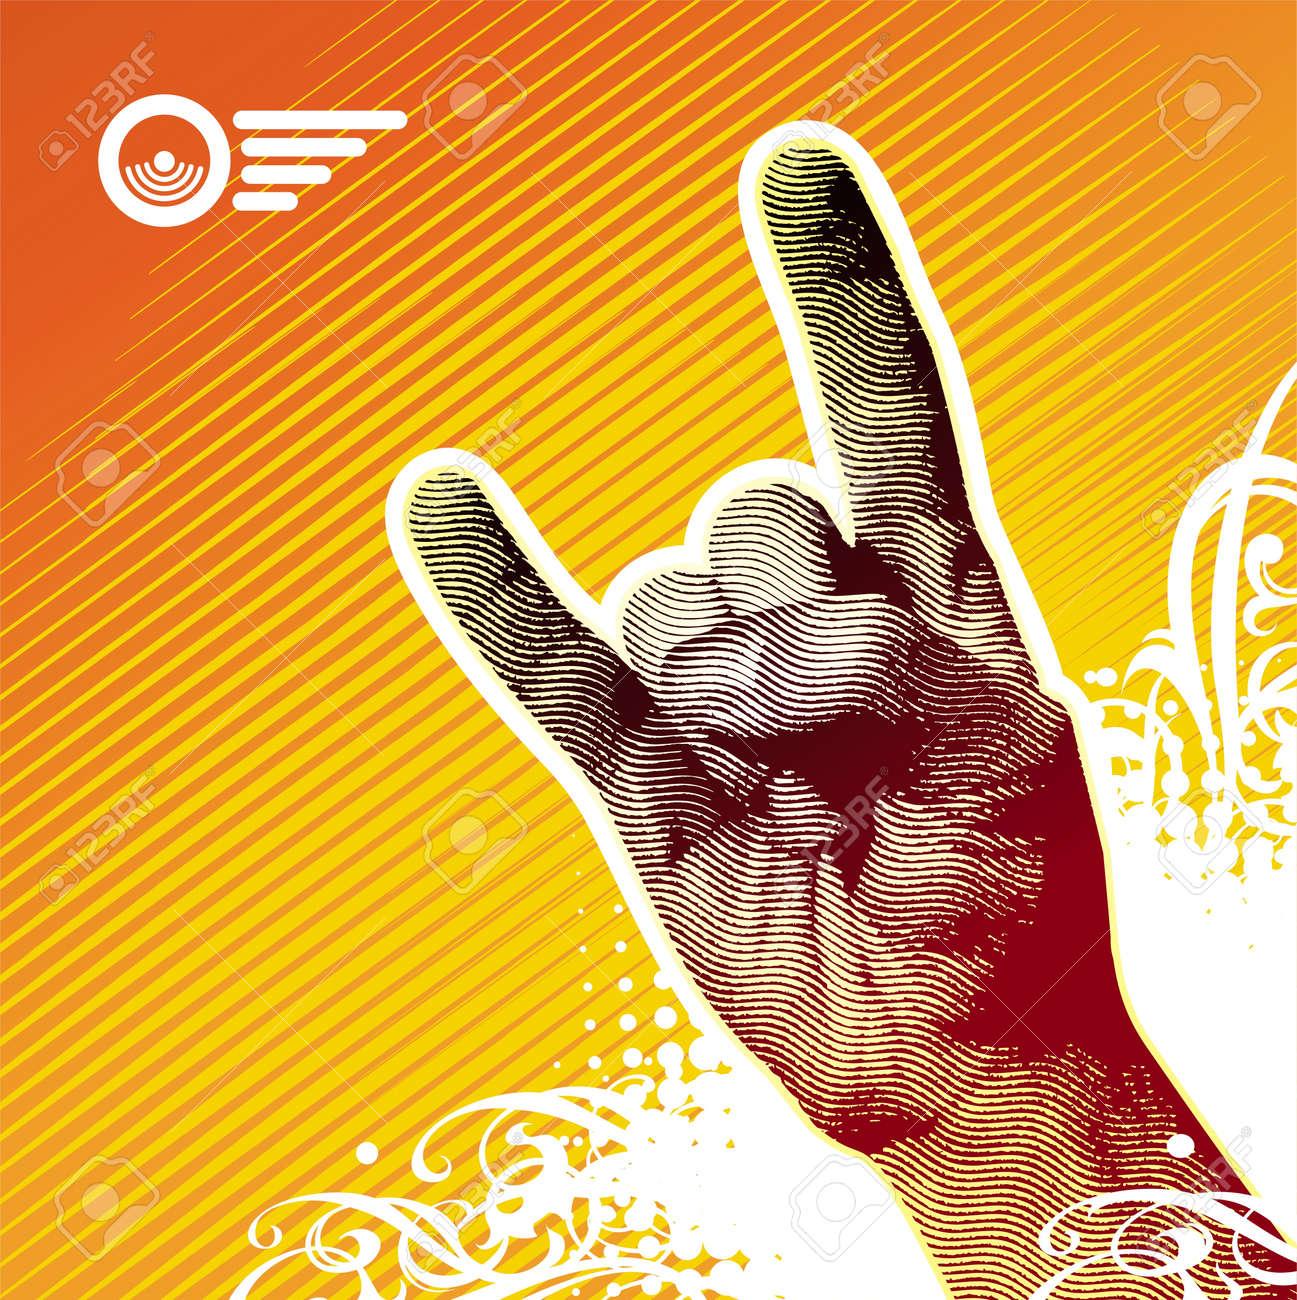 Heavy metal hand sign - vector illustration Stock Vector - 9903091